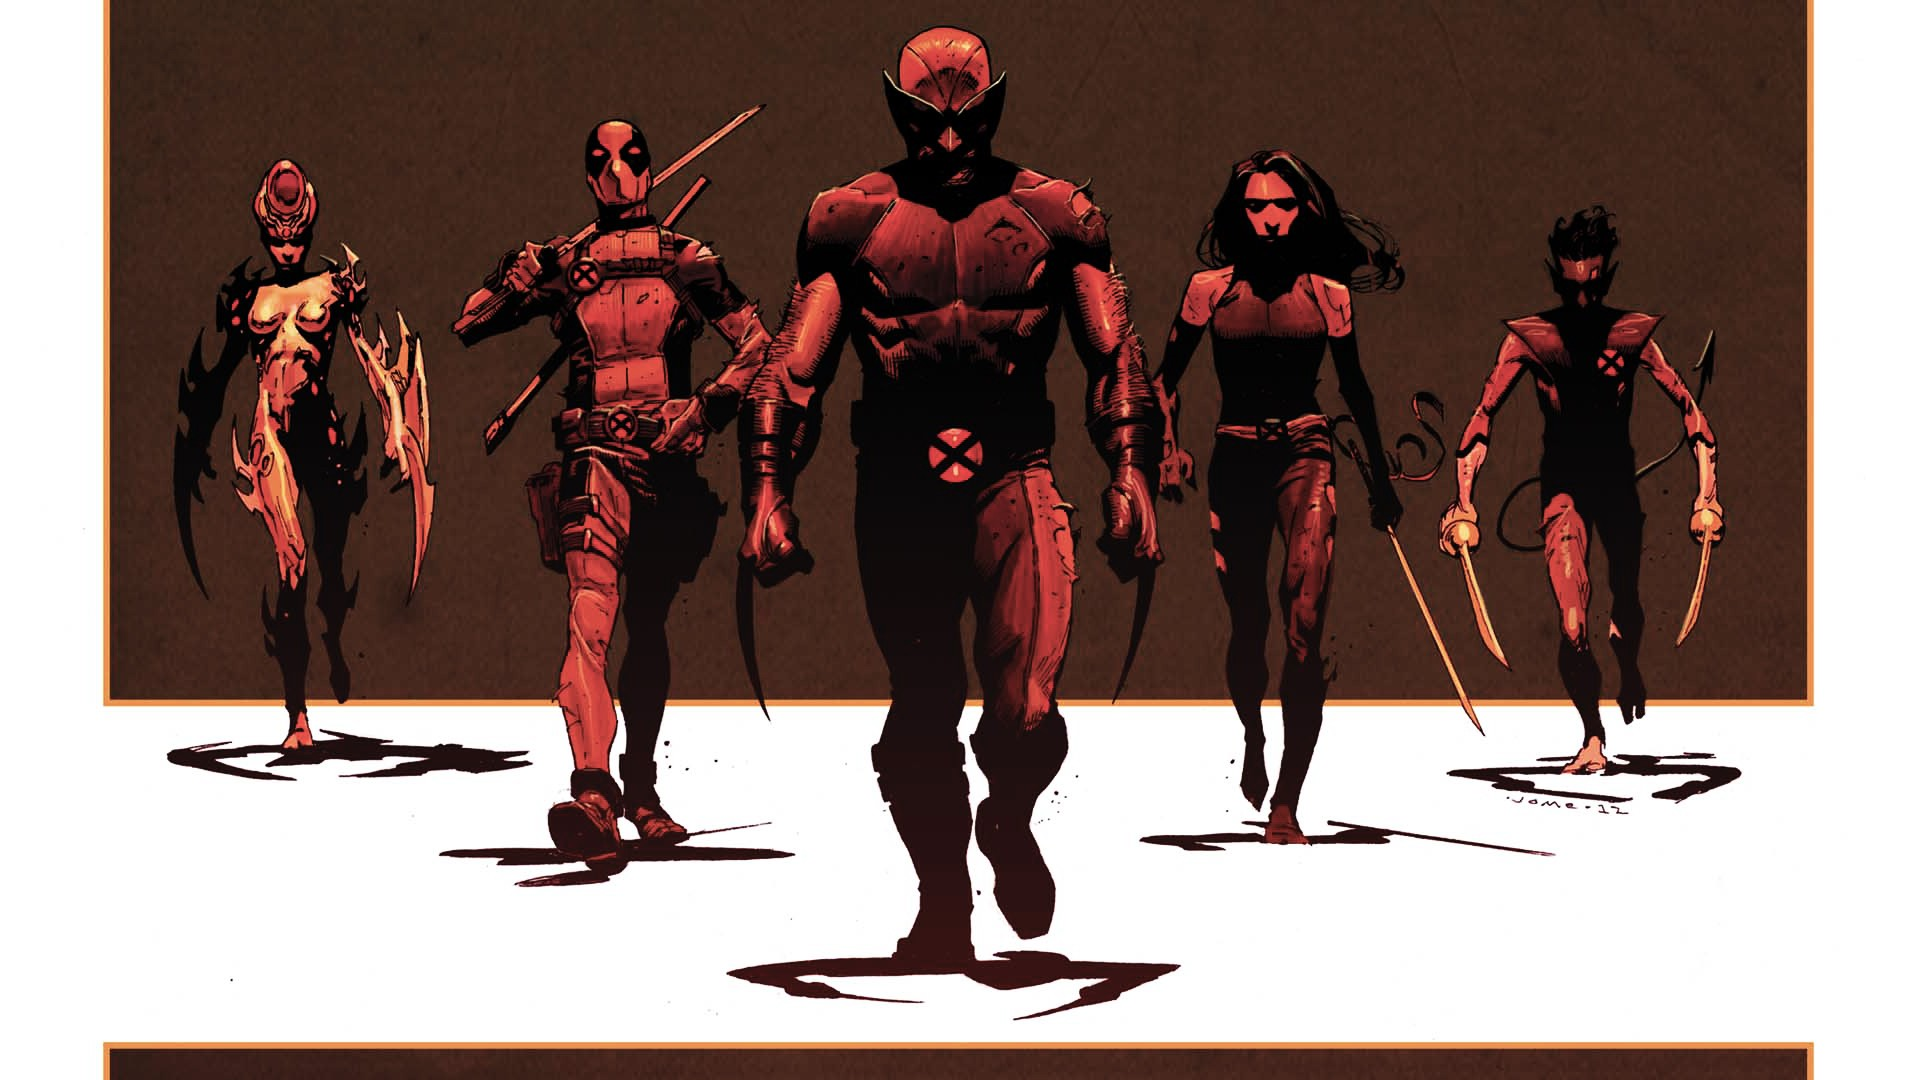 X Men Wolverine Deadpool Wade Wilson Psylocke X Force Nightcrawler 1920x1080